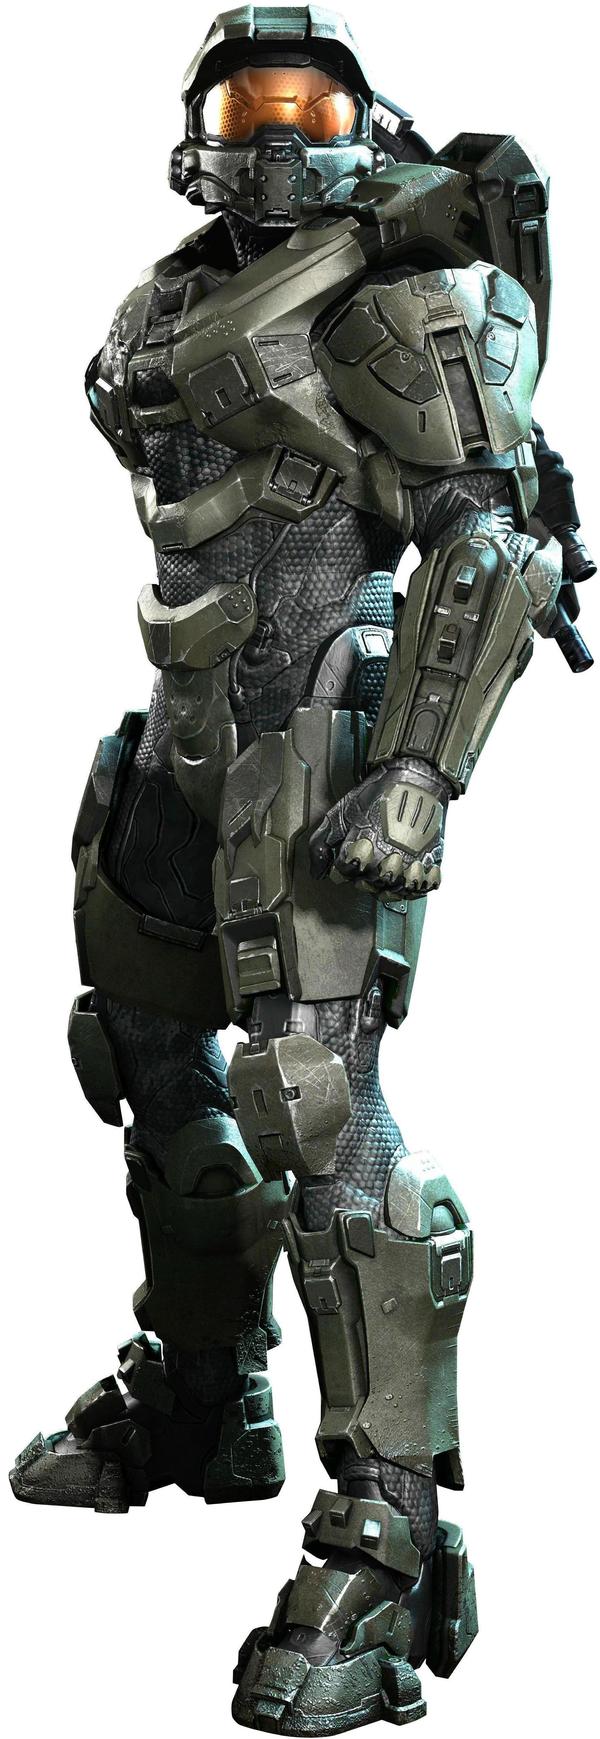 Halo 4 Master Chief John 117 Halo Game Halo 4 Halo Armor